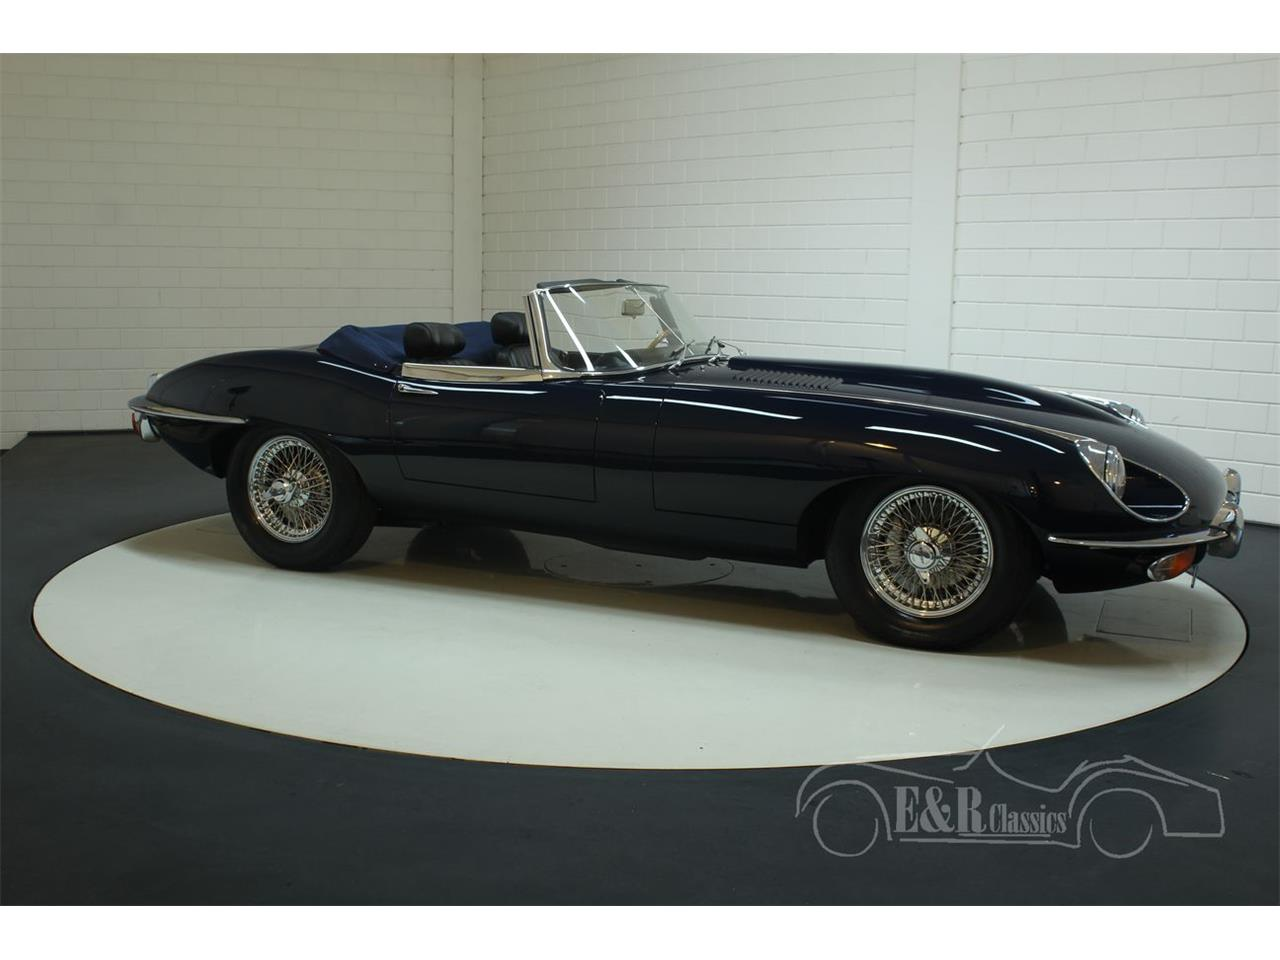 Large Picture of 1969 Jaguar E-Type - $139,400.00 - Q45K